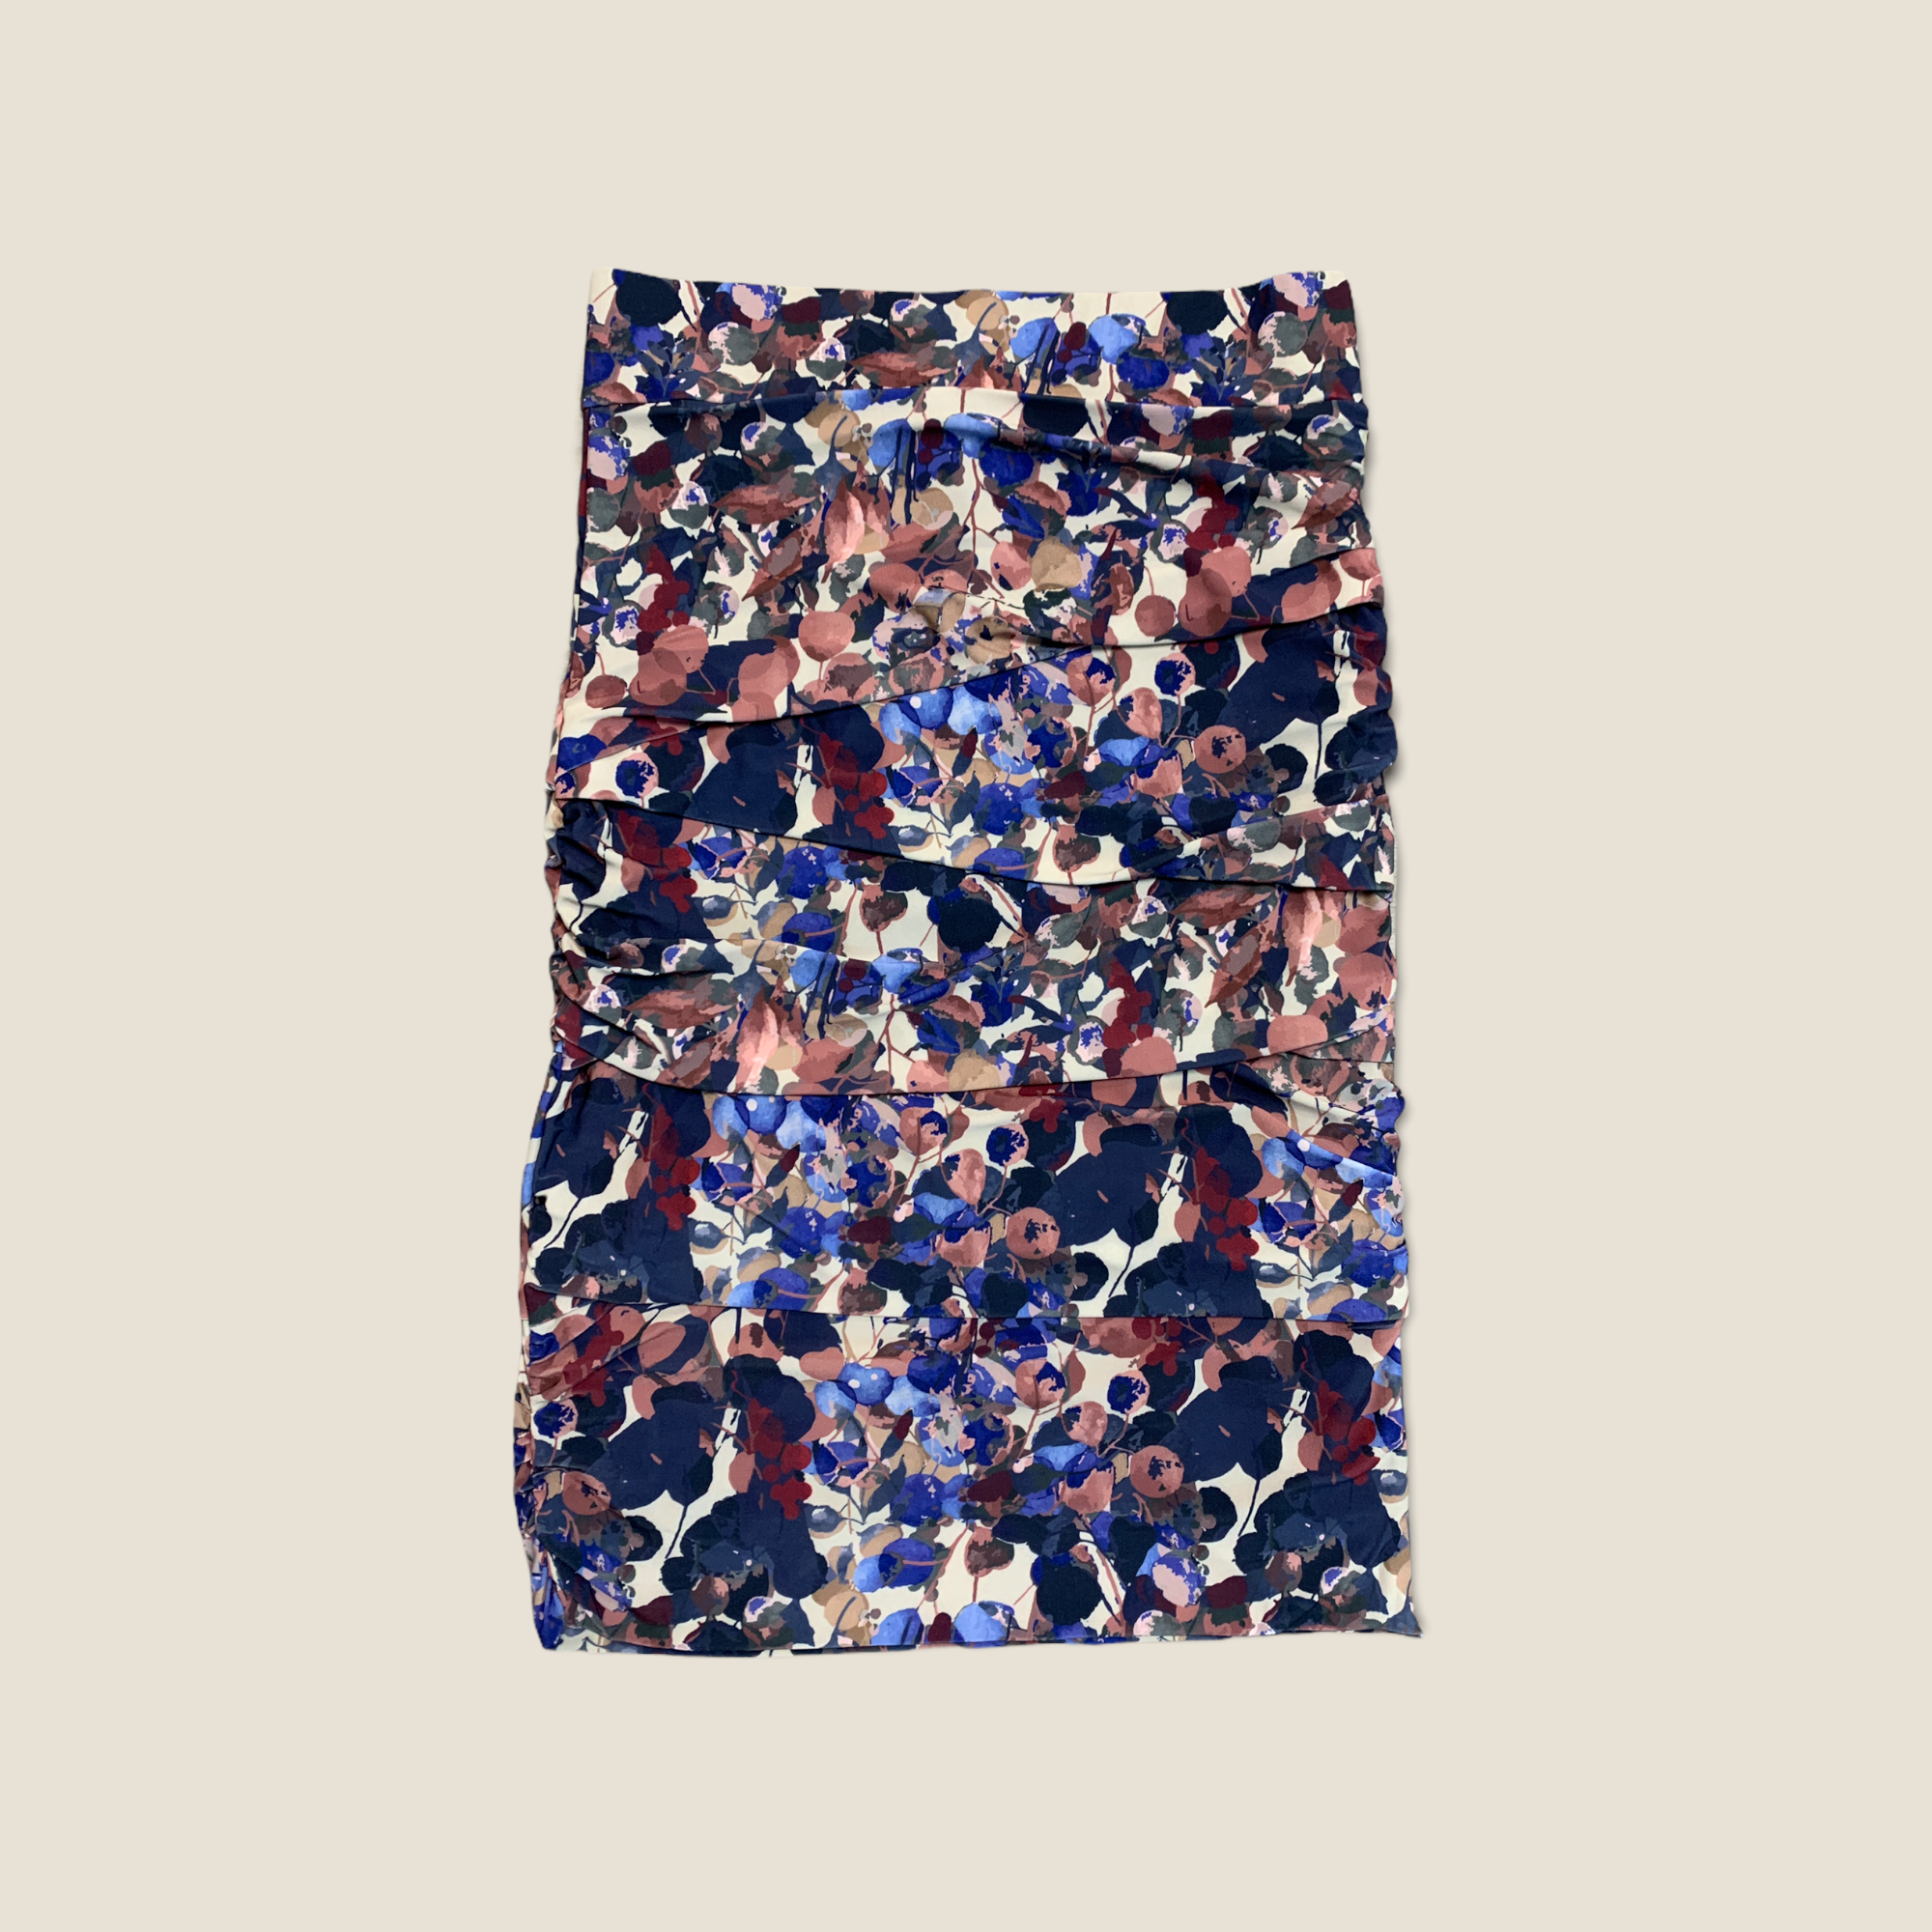 Layered Skirt - Berry Fields